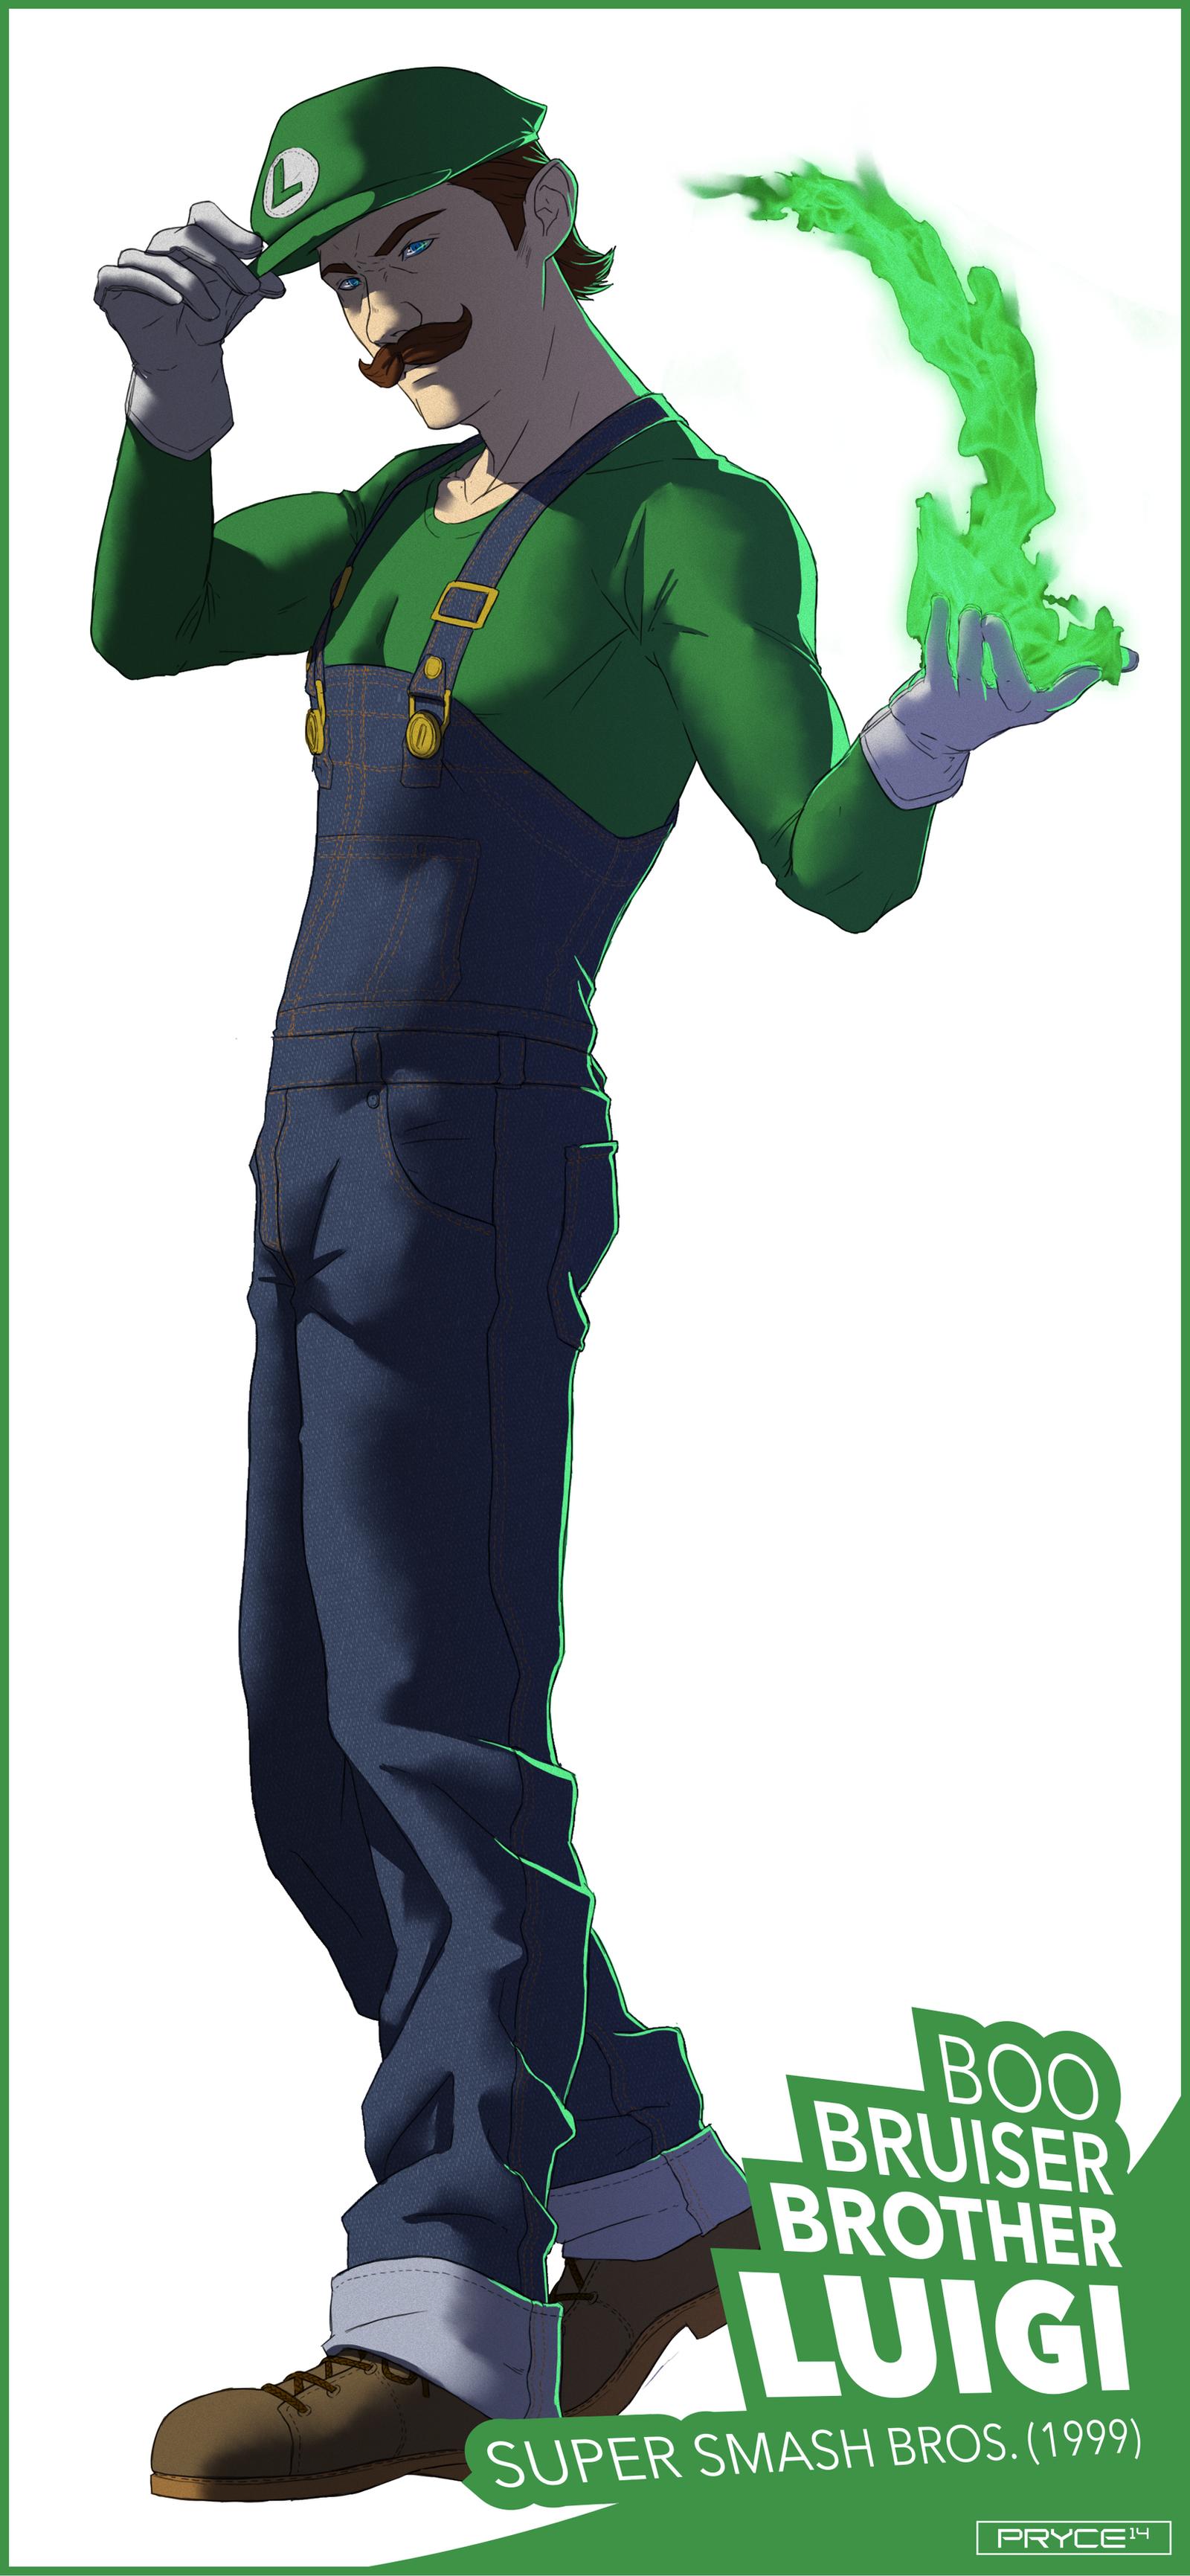 Luigi by Pryce14